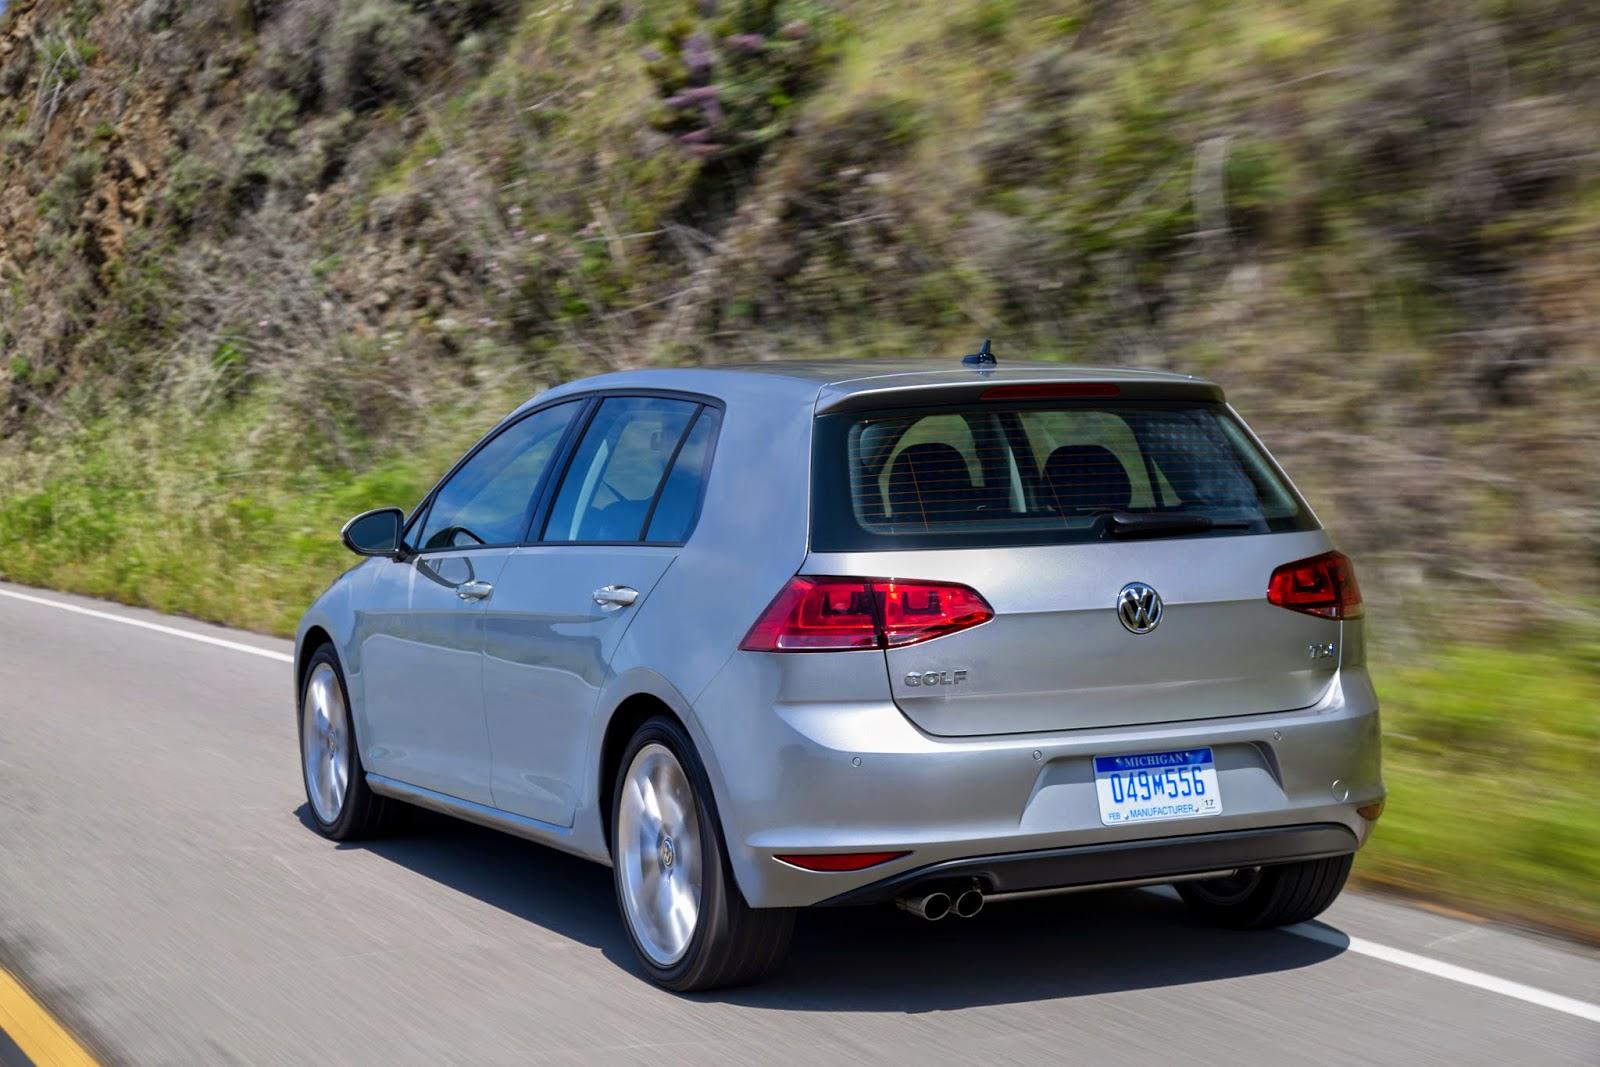 Rear 3/4 view of 2015 Volkswagen Golf TDI